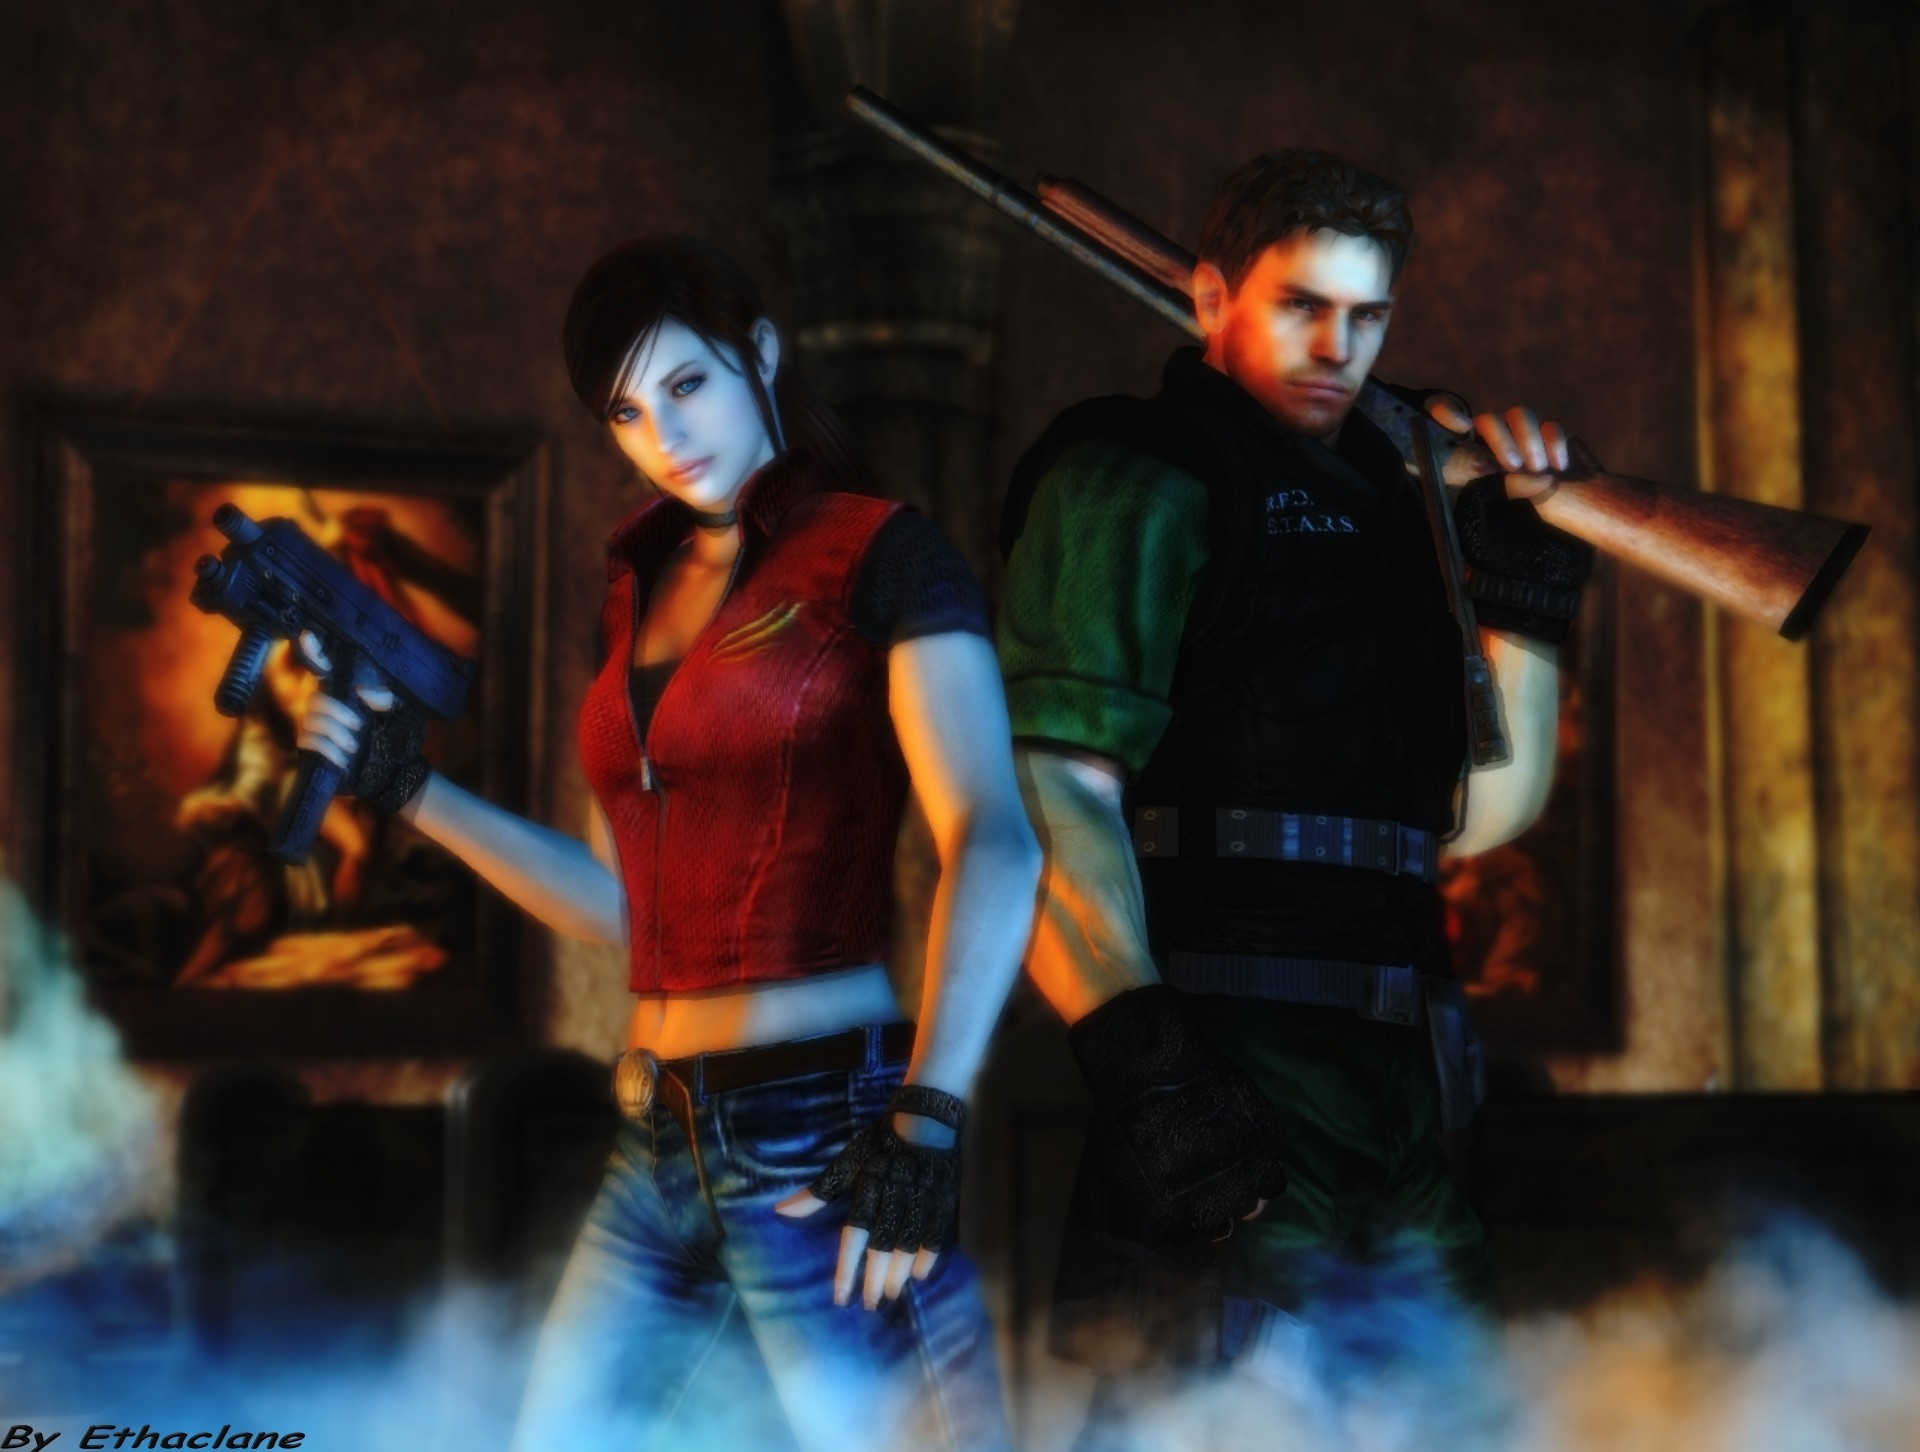 Res: 1920x1452, 1920x1200 Chris Redfield and Sheva Alomar wallpaper from Resident Evil 5  Chris, Sheva and belongs to capcom Chris and Sheva Wallpaper 1